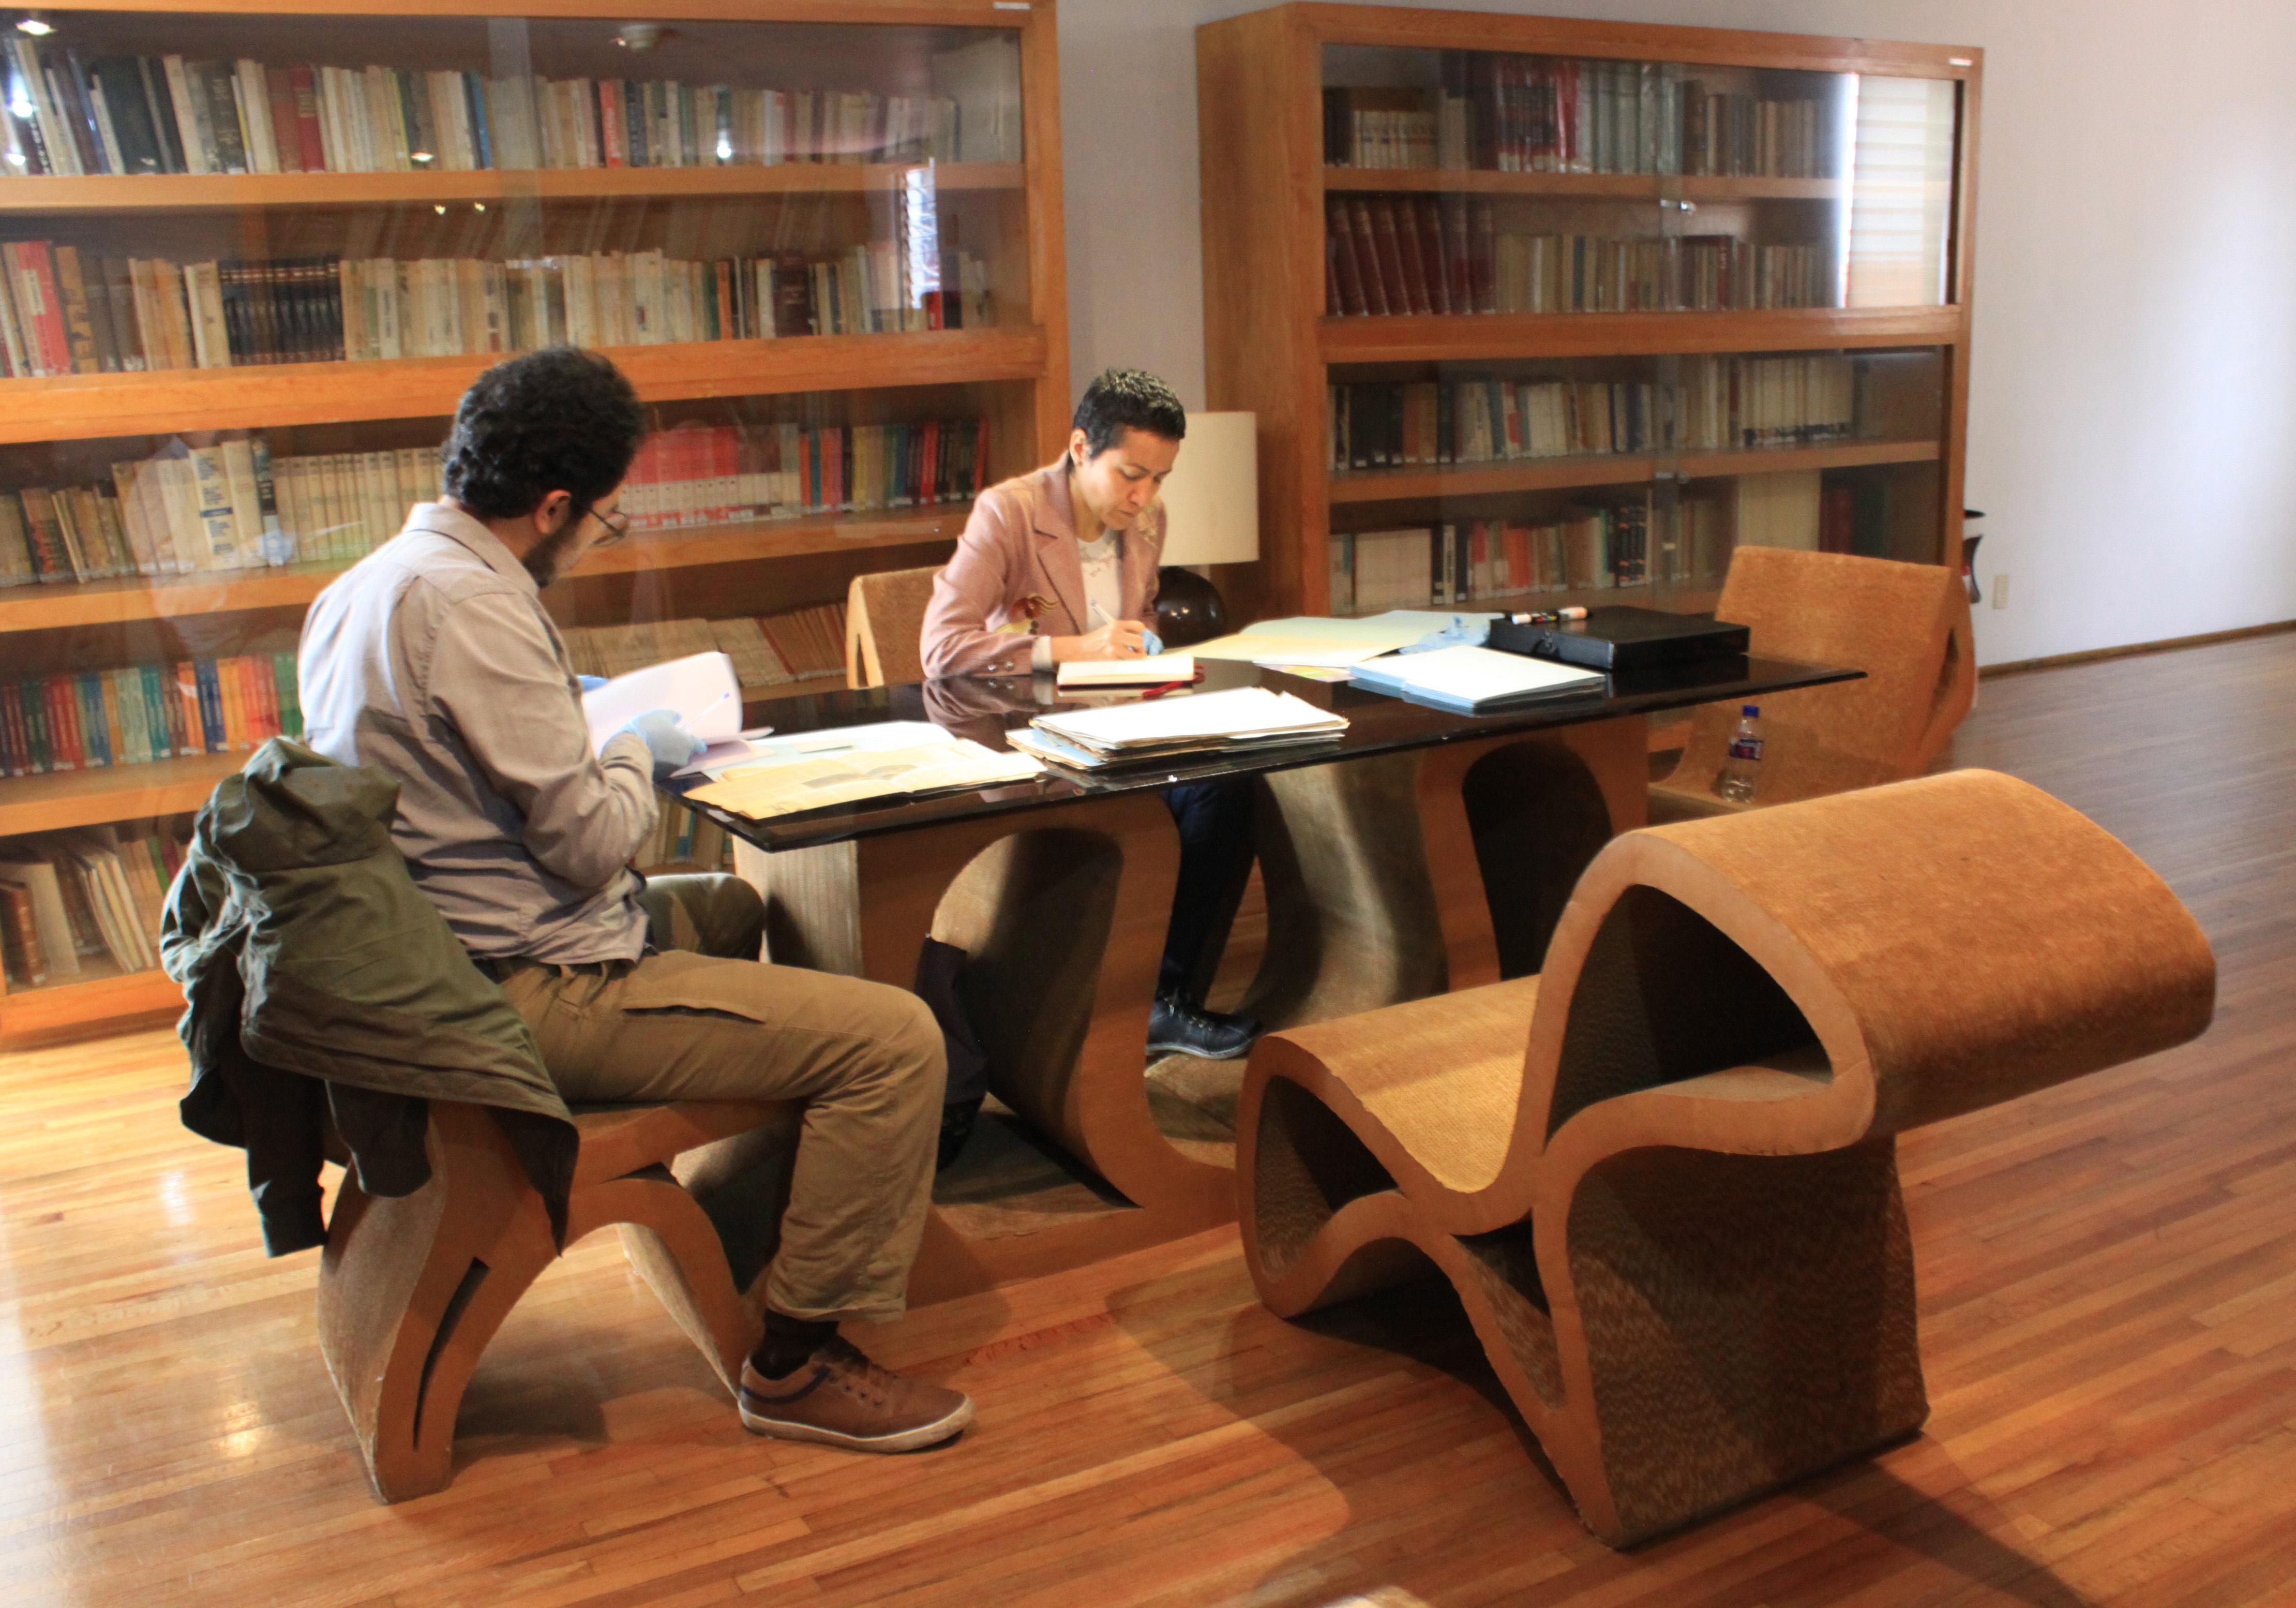 Siqueiros_library_BTYW.jpg